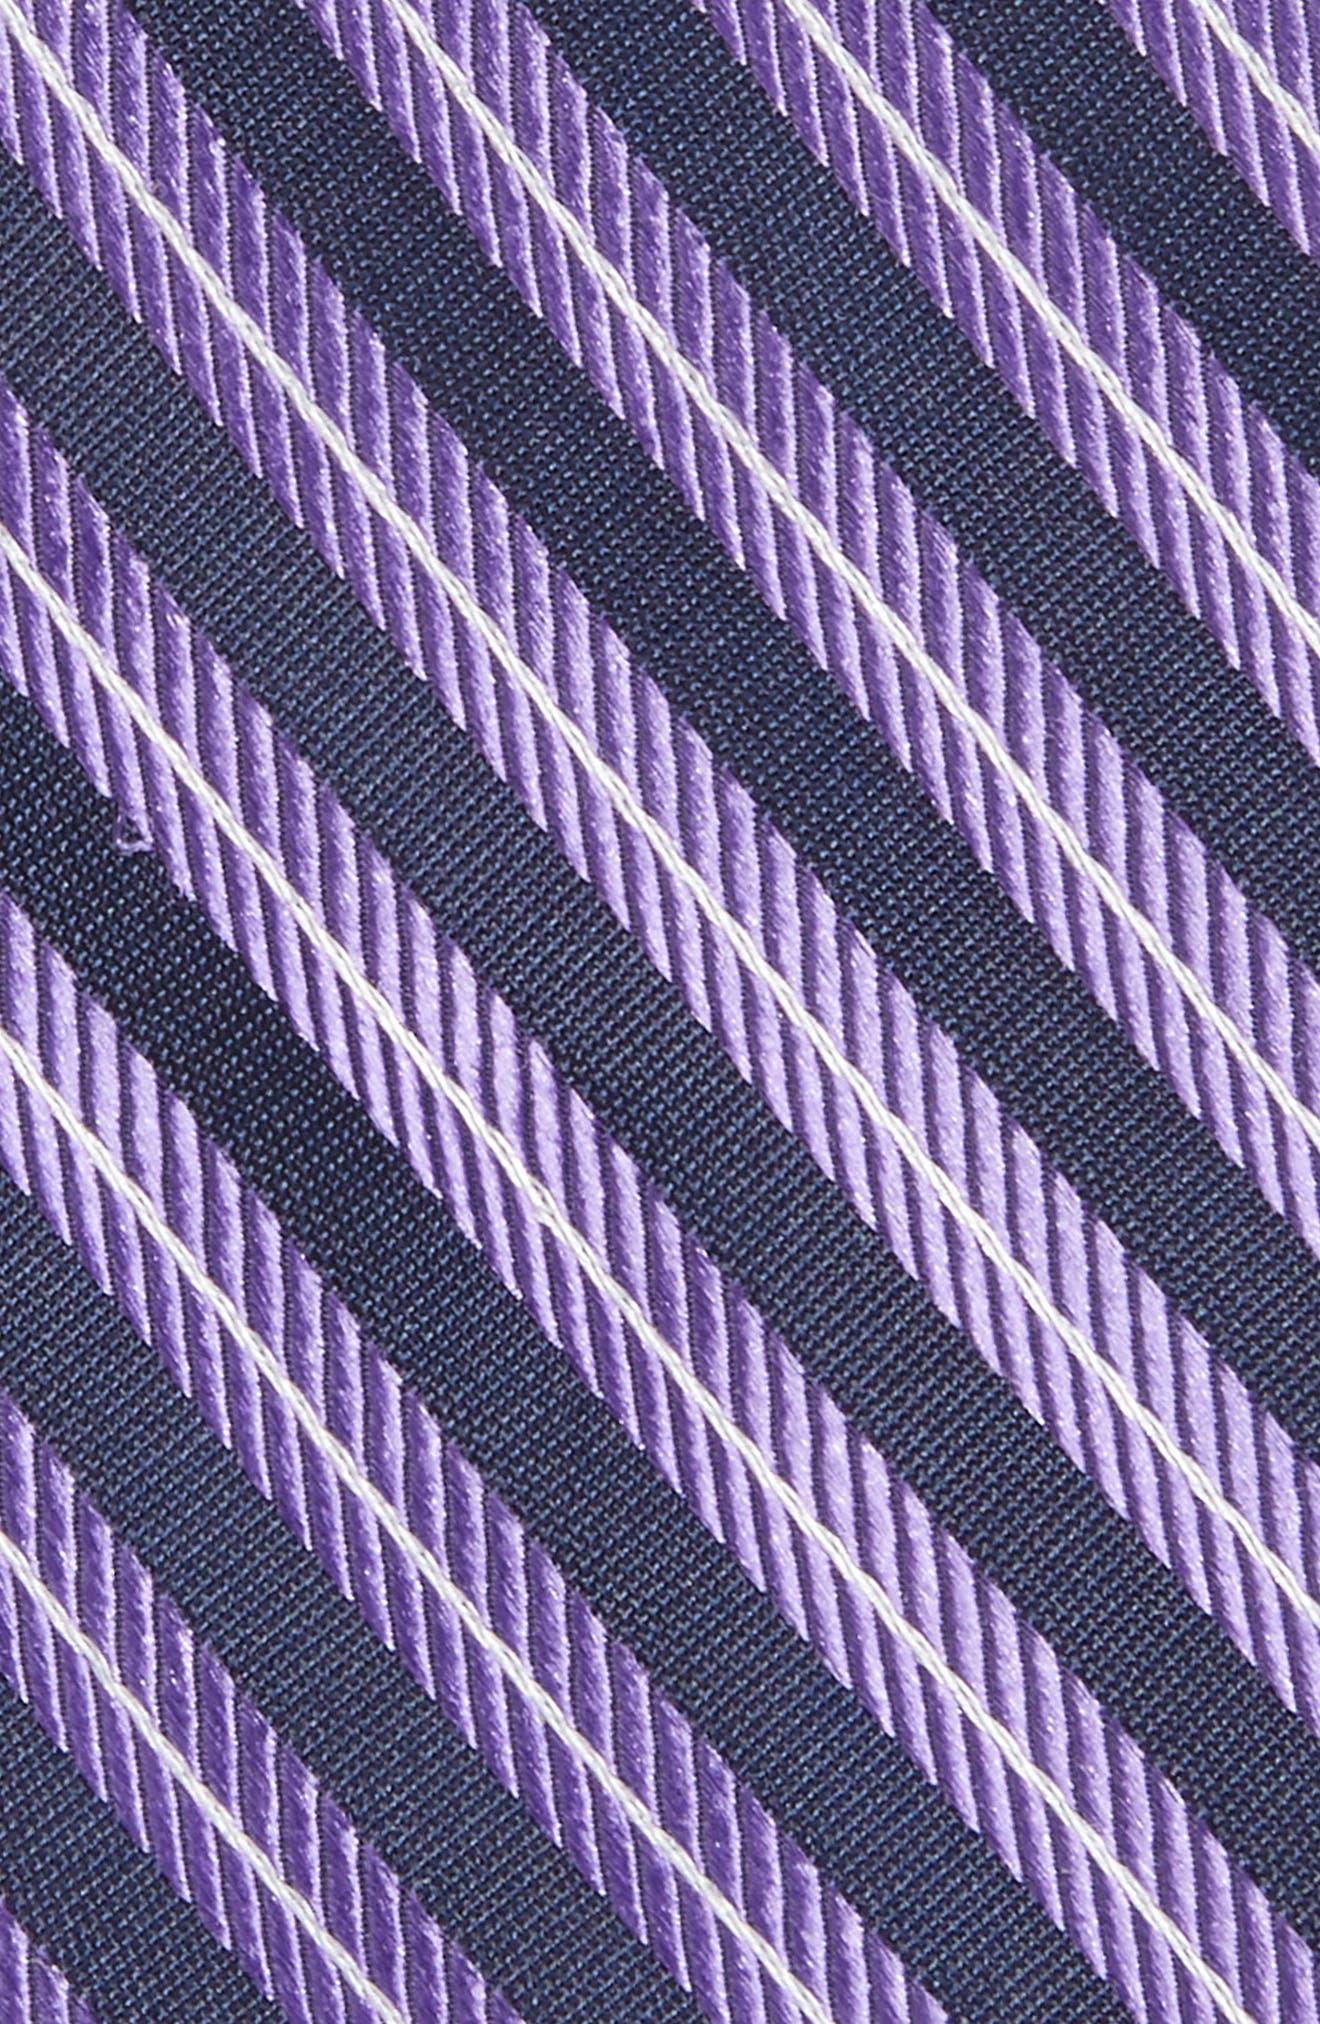 Milliner Stripe Silk Tie,                             Alternate thumbnail 5, color,